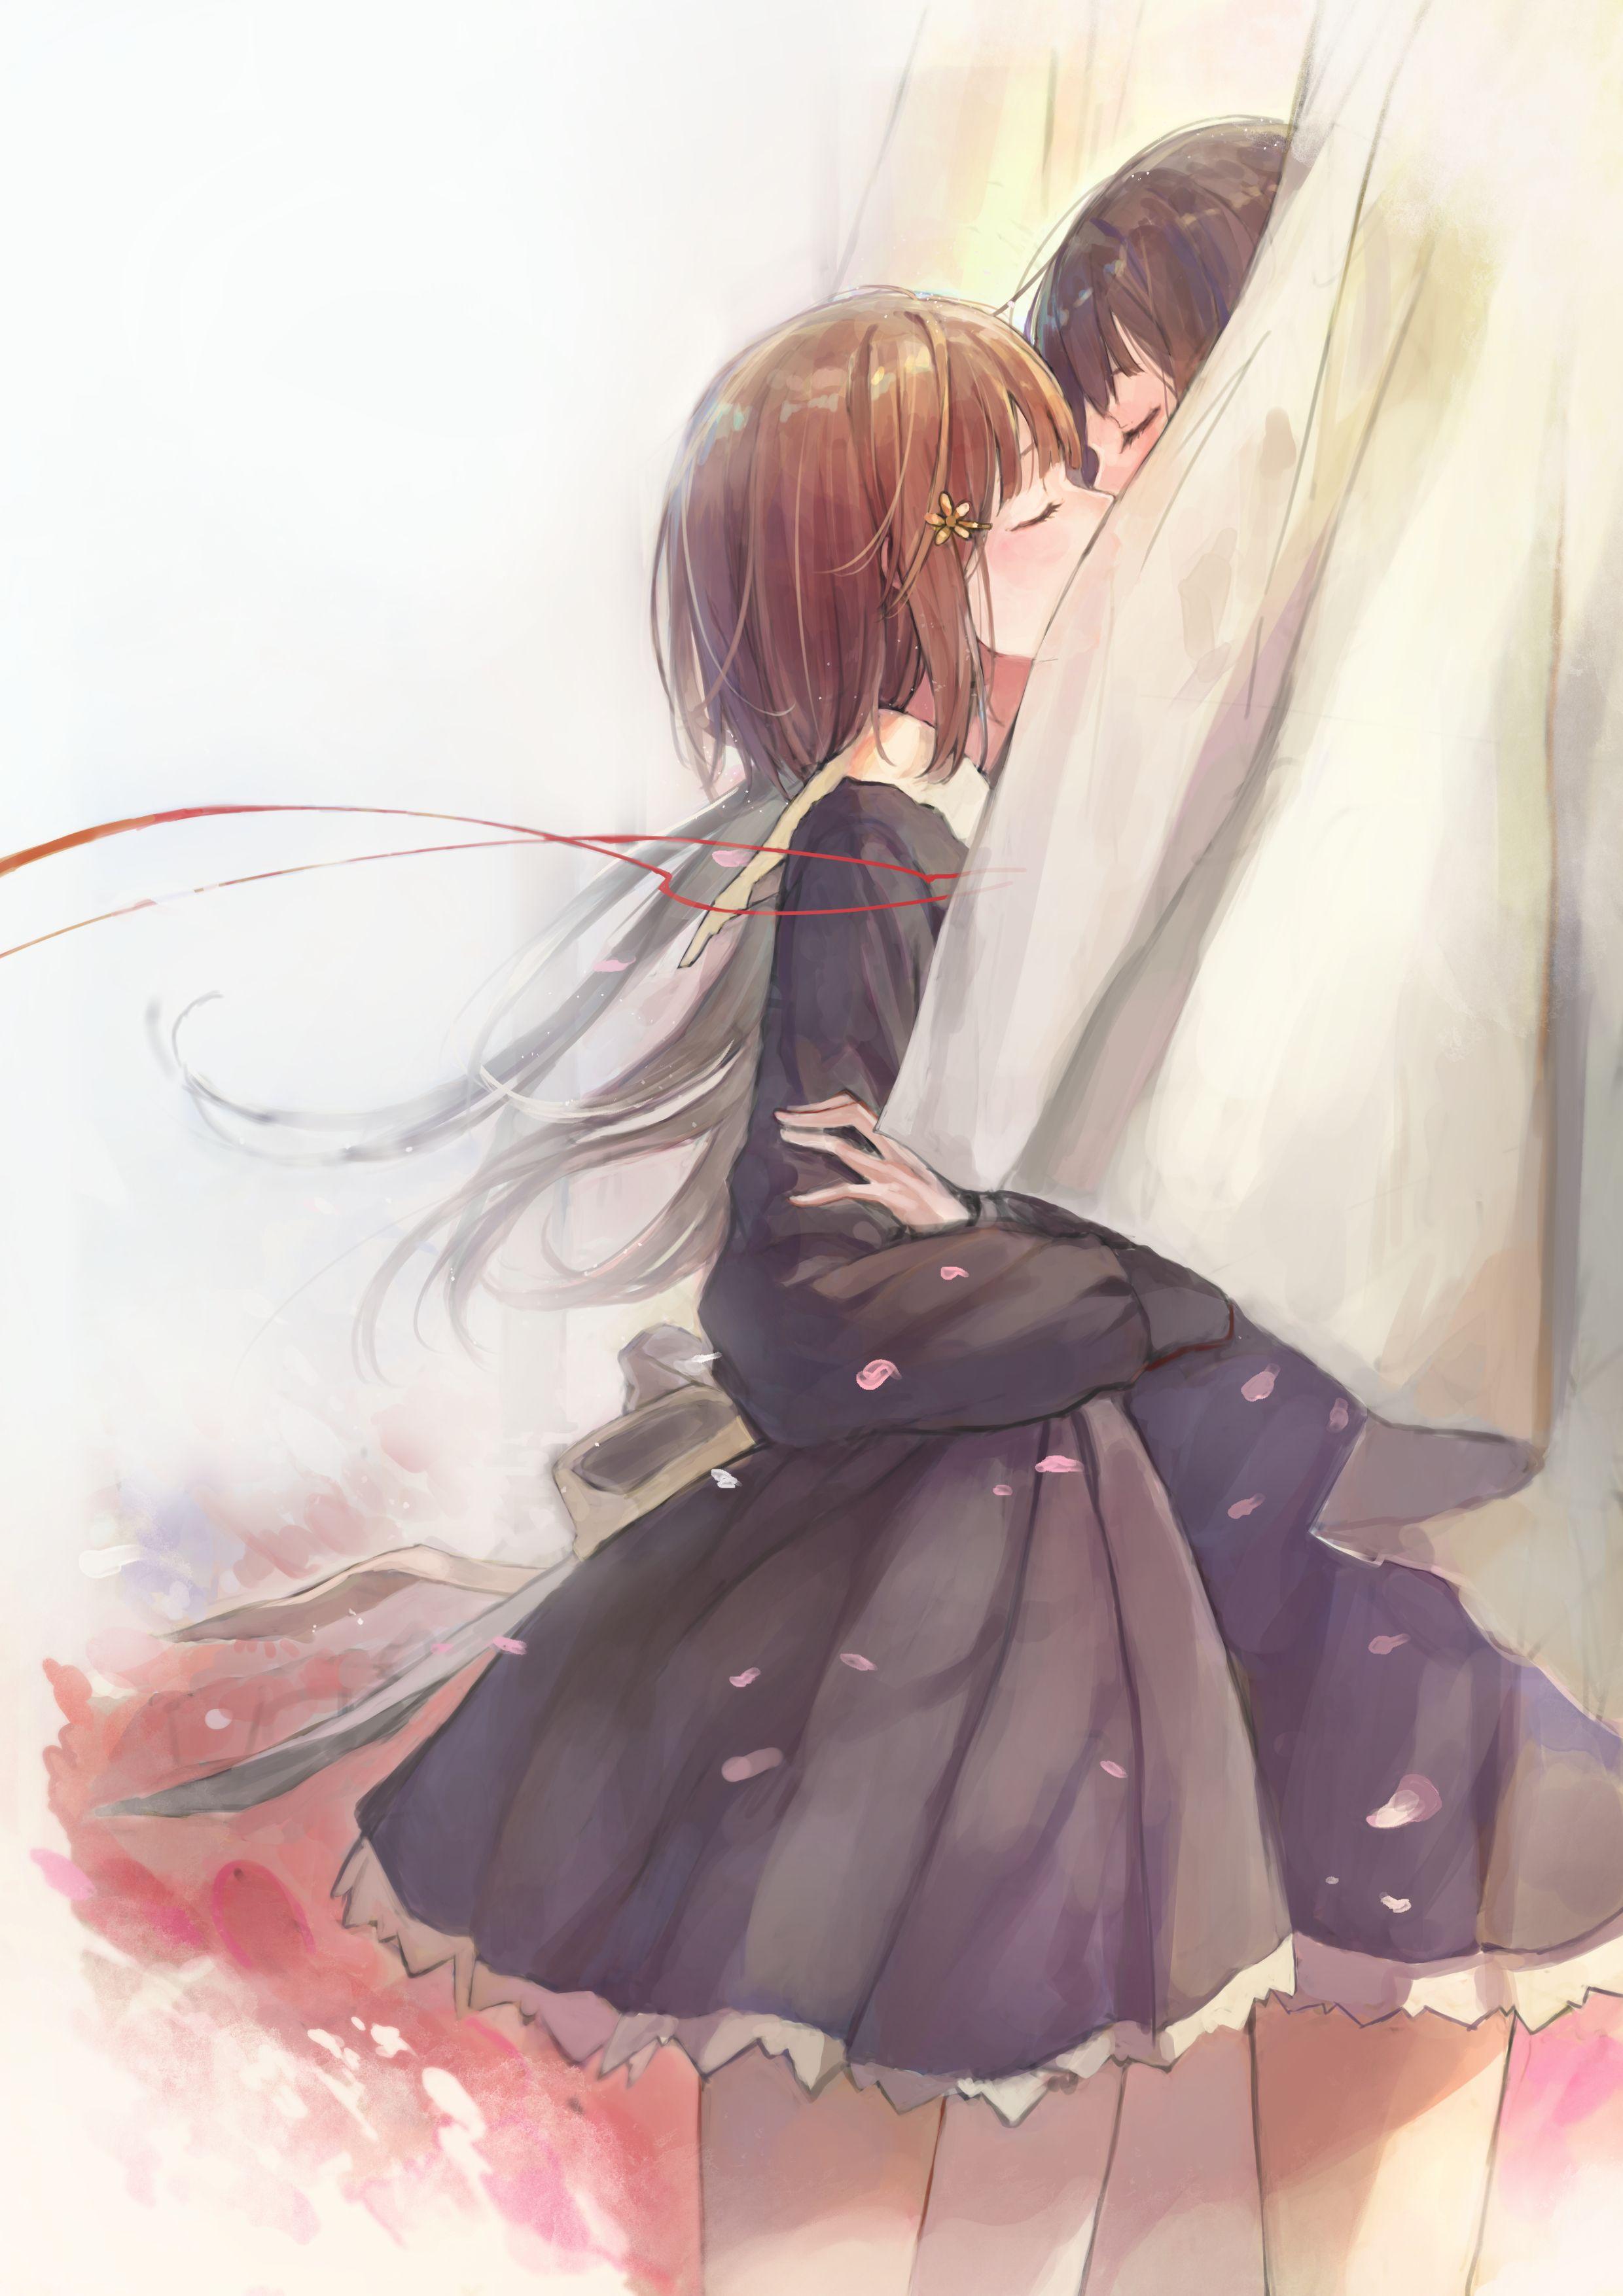 Pin By Atefeh Bamoradi On Anime Yuri Anime Anime Chibi Anime Images, Photos, Reviews